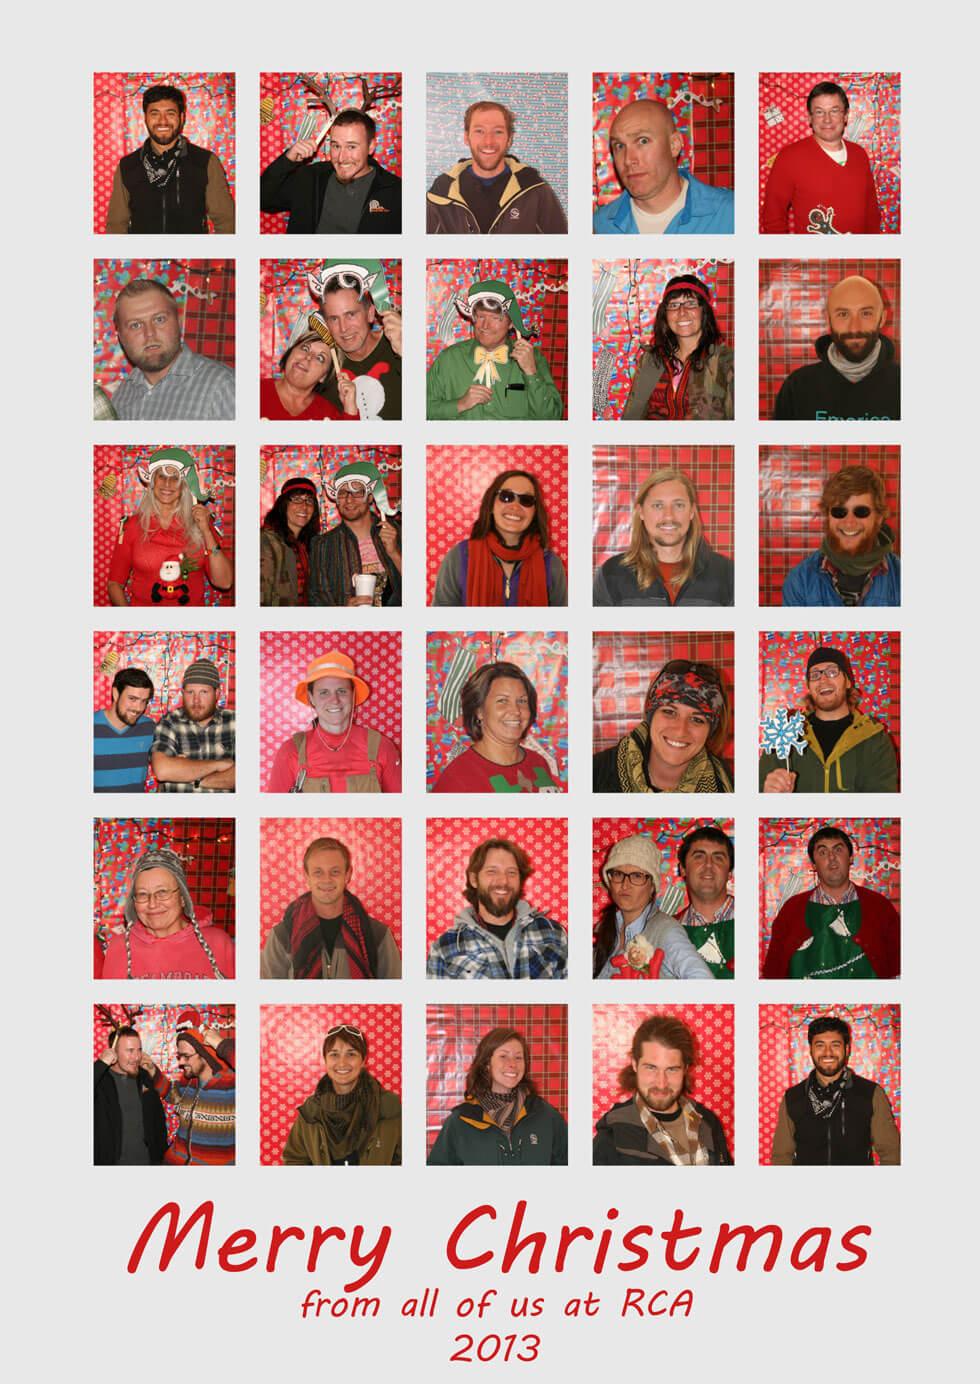 RCA-Christmas-Photos